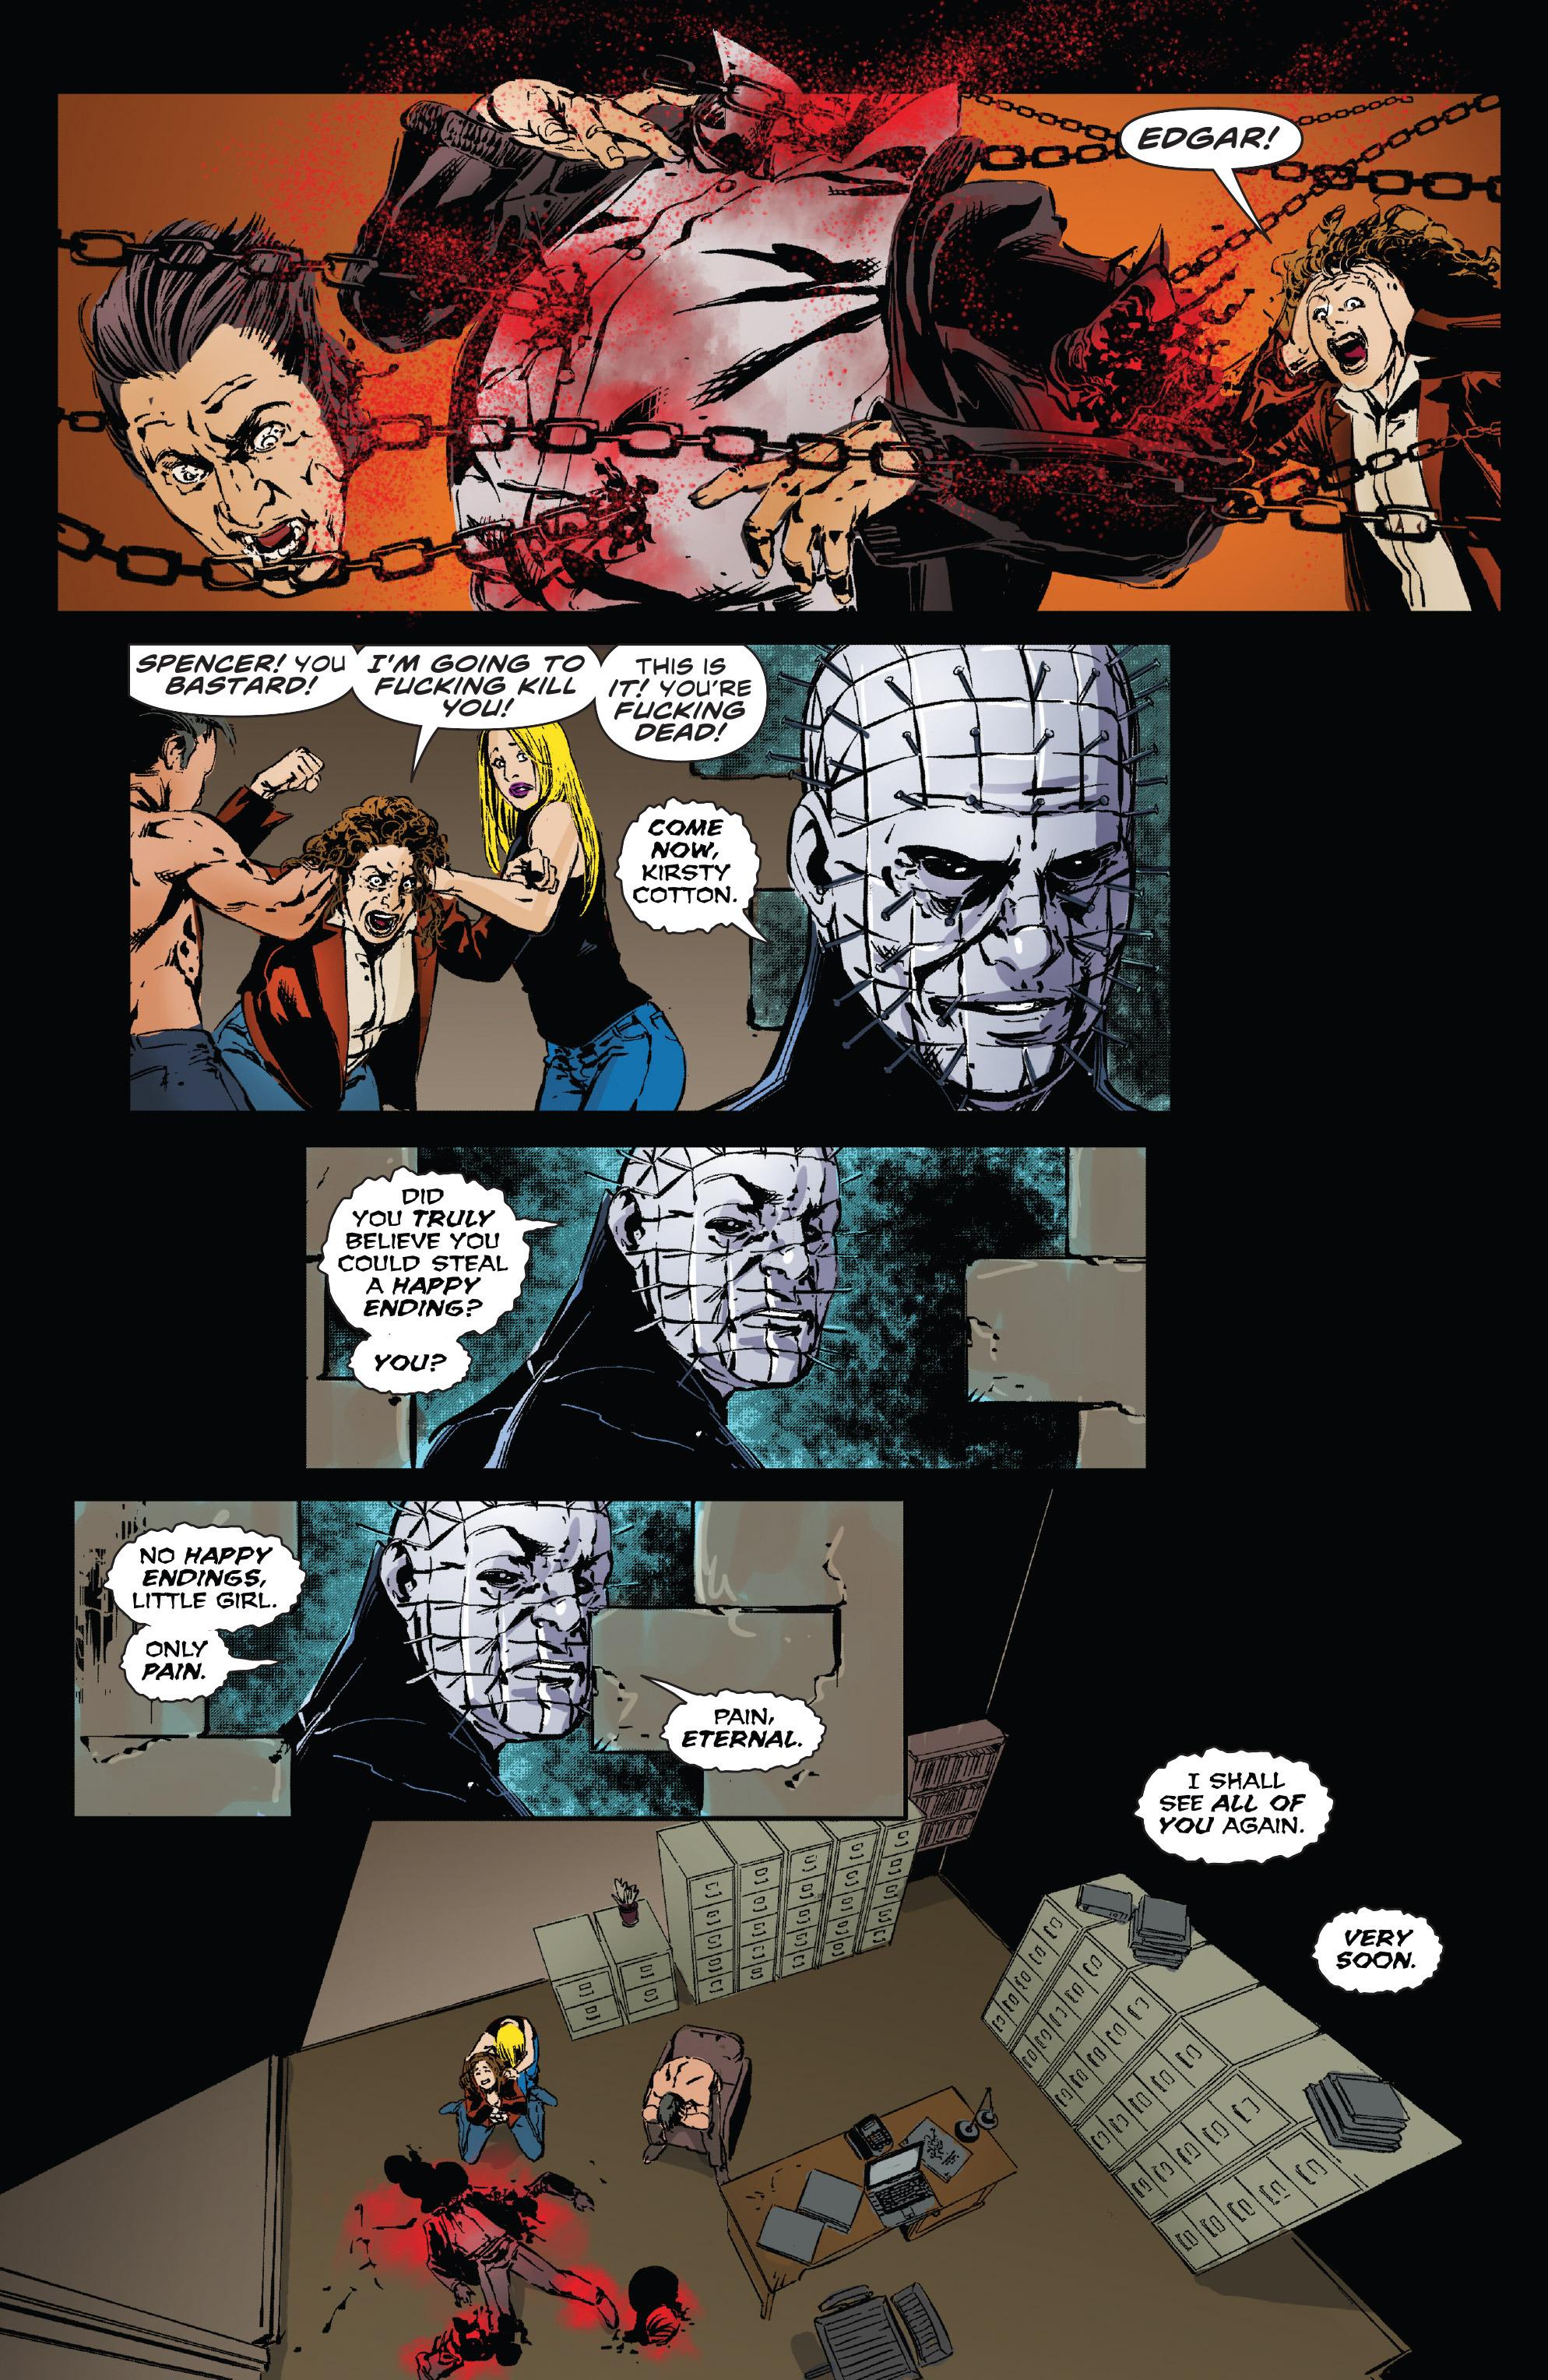 Read online Clive Barker's Hellraiser: The Dark Watch comic -  Issue # TPB 3 - 127